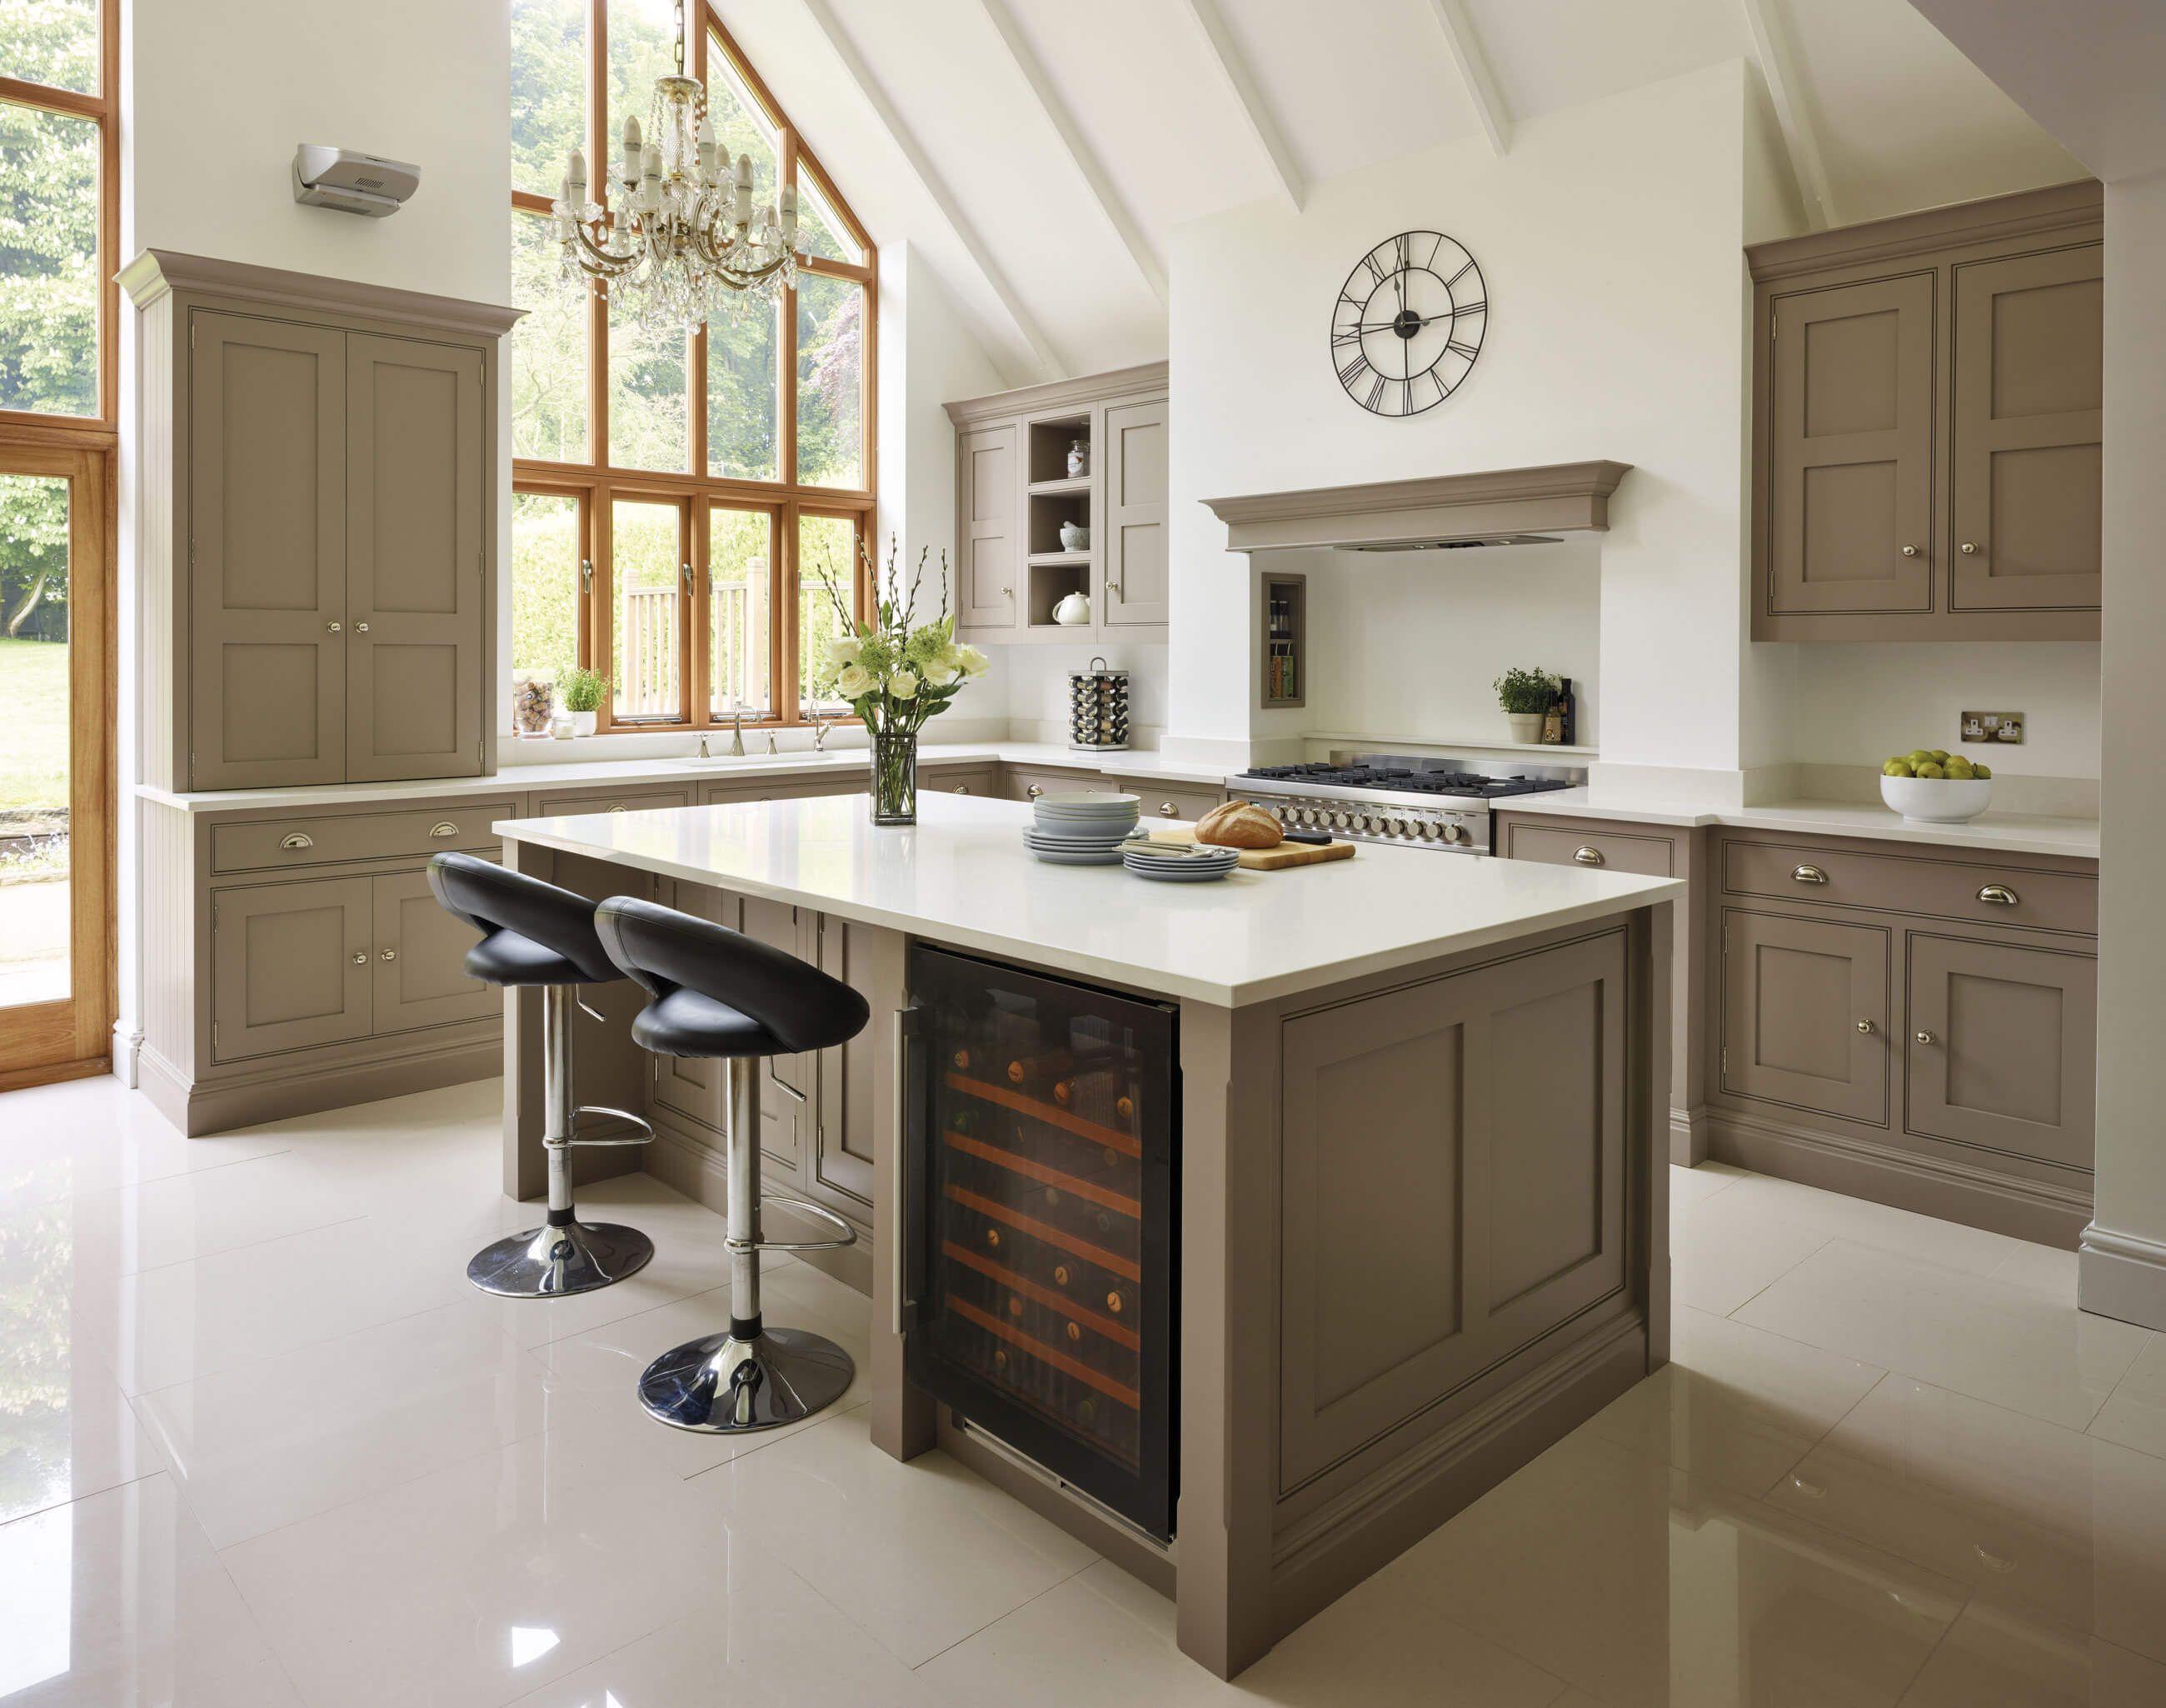 Best Classic Shaker Kitchen Modern Shaker Kitchen Country 400 x 300